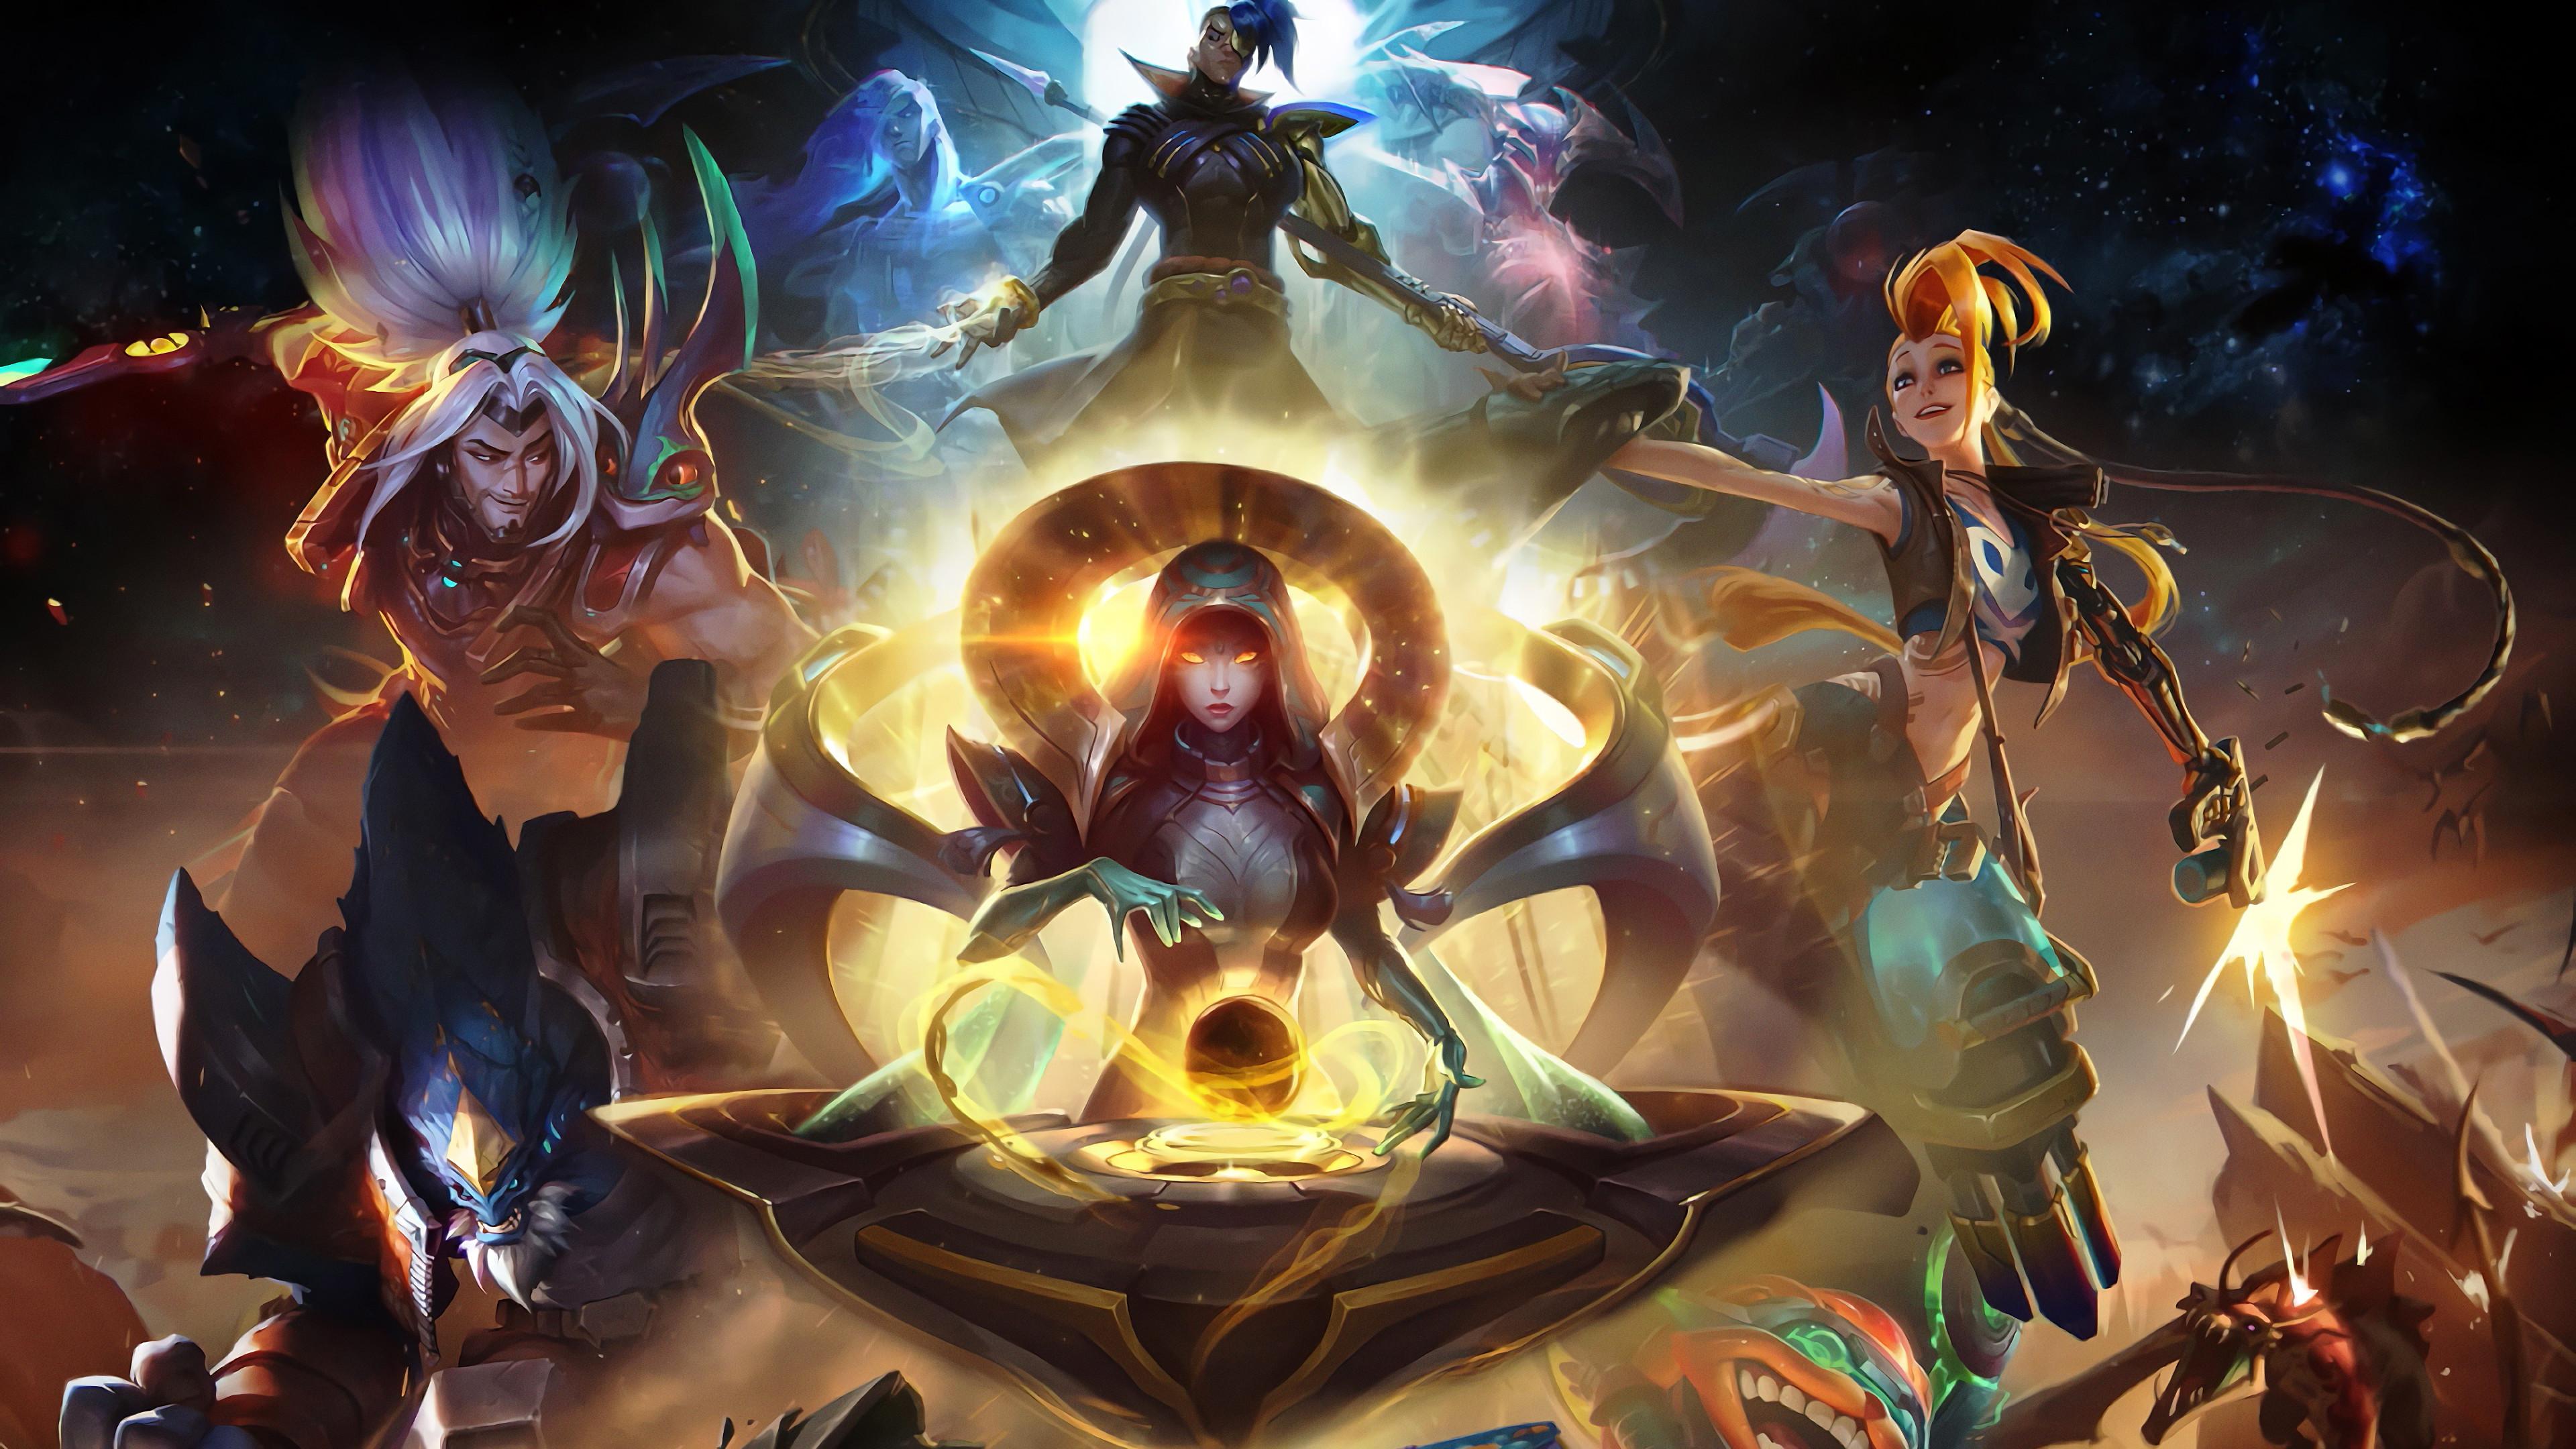 Wallpaper Untuk Legends Mobile Hd 4k For Android: League Of Legends Jinx Malphite Kayn Yasuosona Ziggs 4k